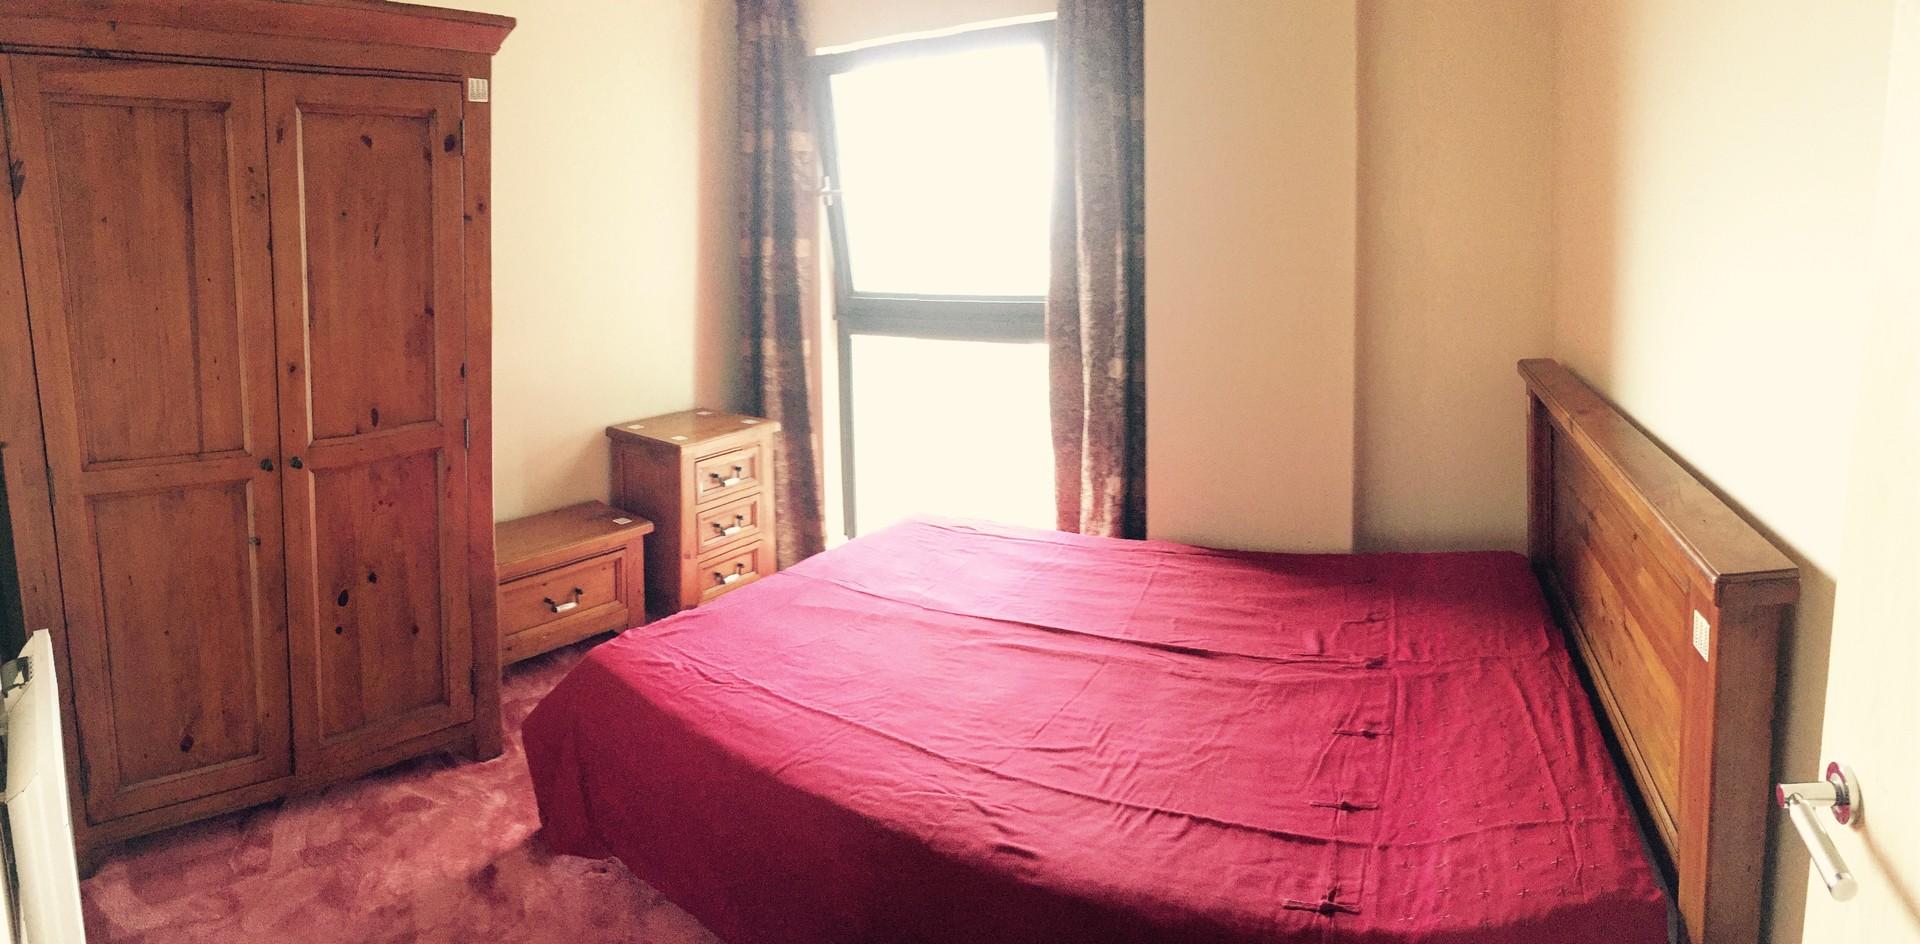 Rent Room Cardiff City Centre